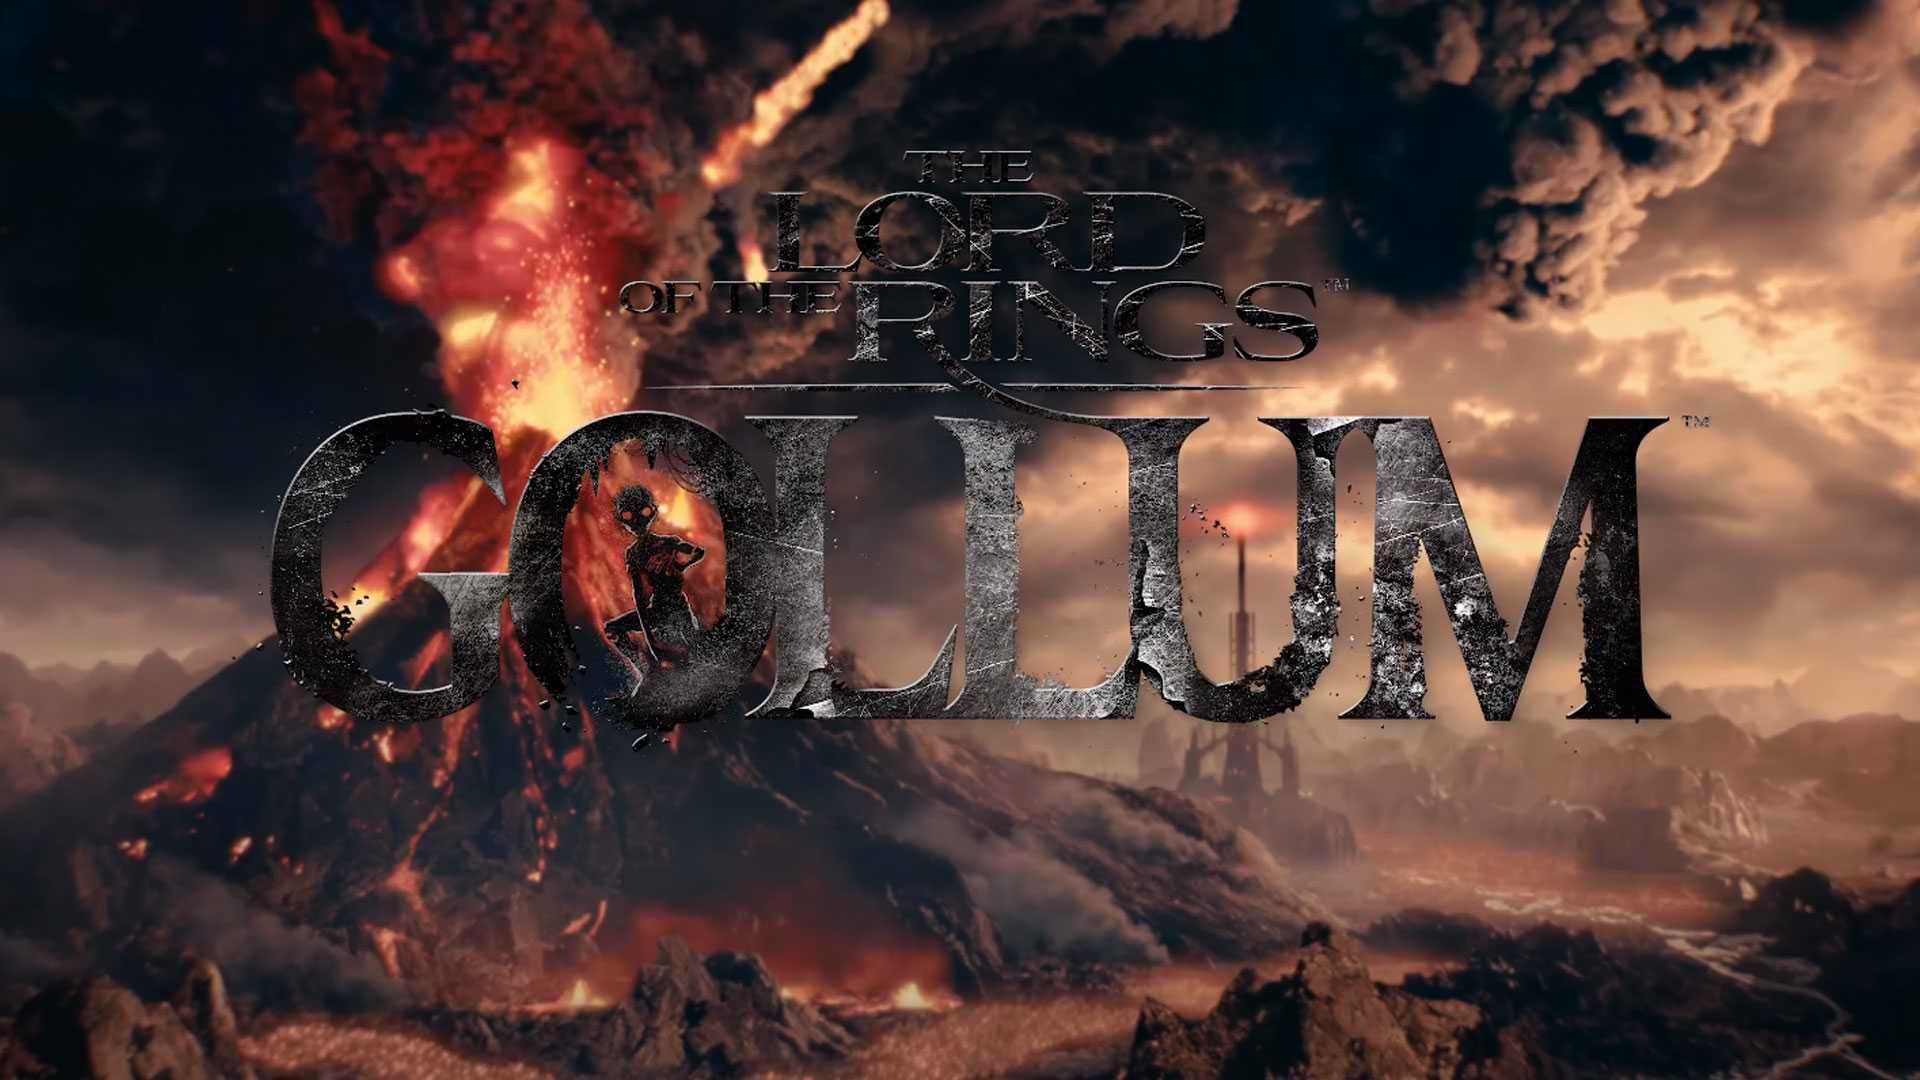 بازی The Lord of the Rings: Gollum